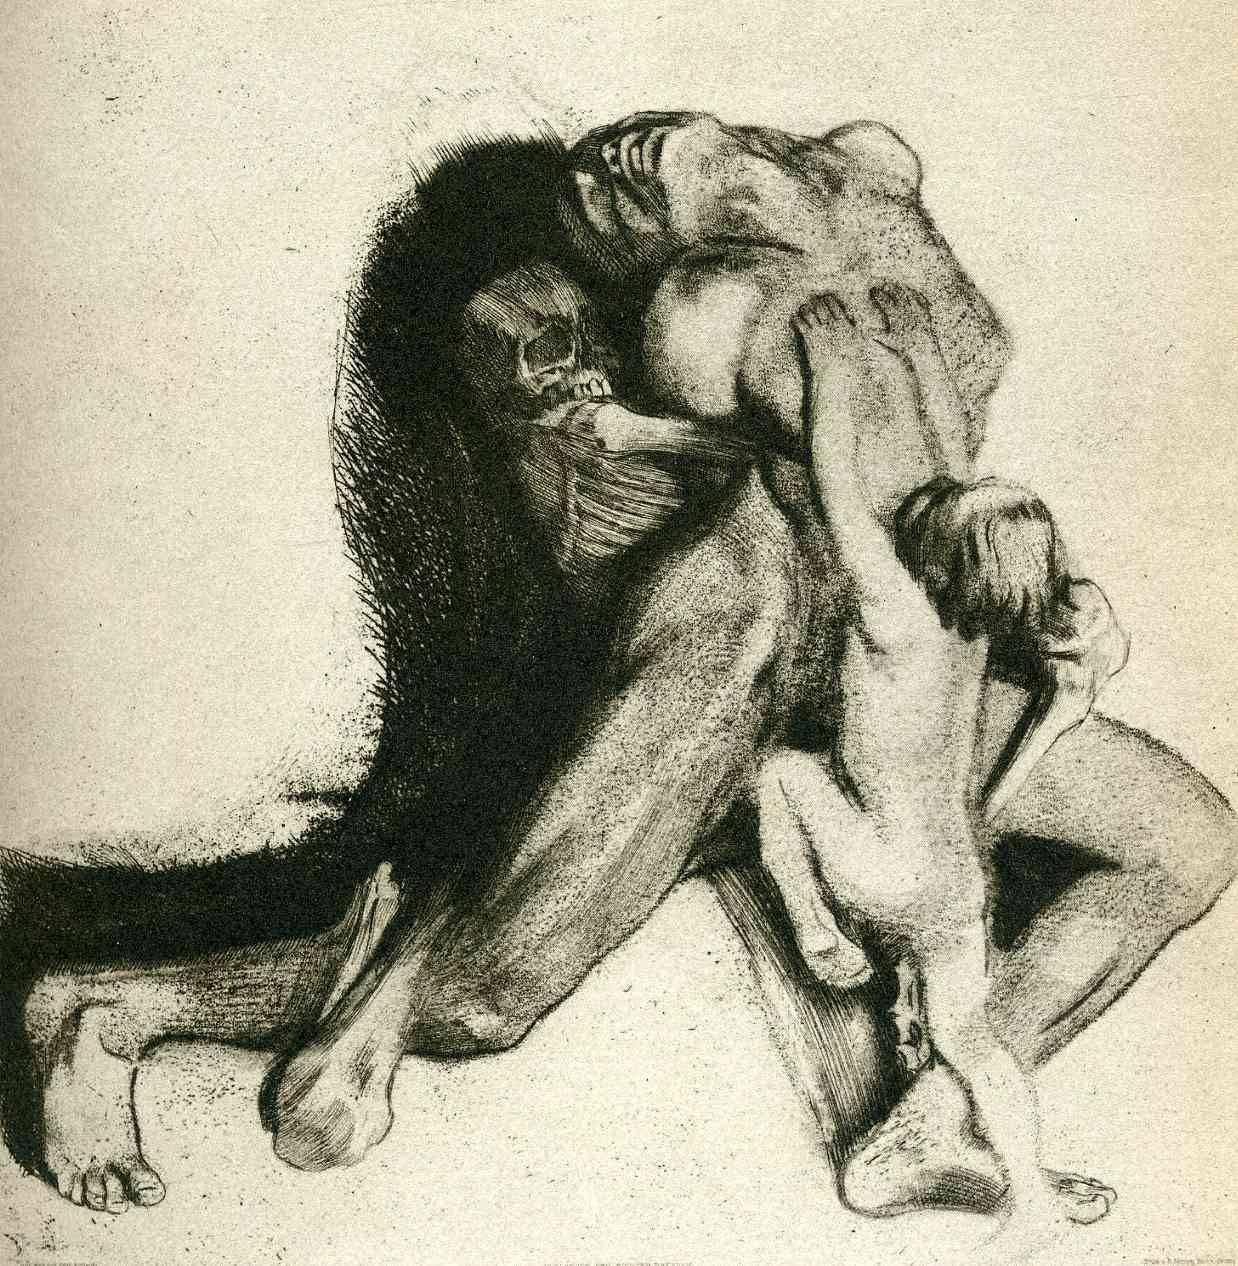 Kathe Kollwitz: Tod und Frau (Death and Woman) 1910. lithograph